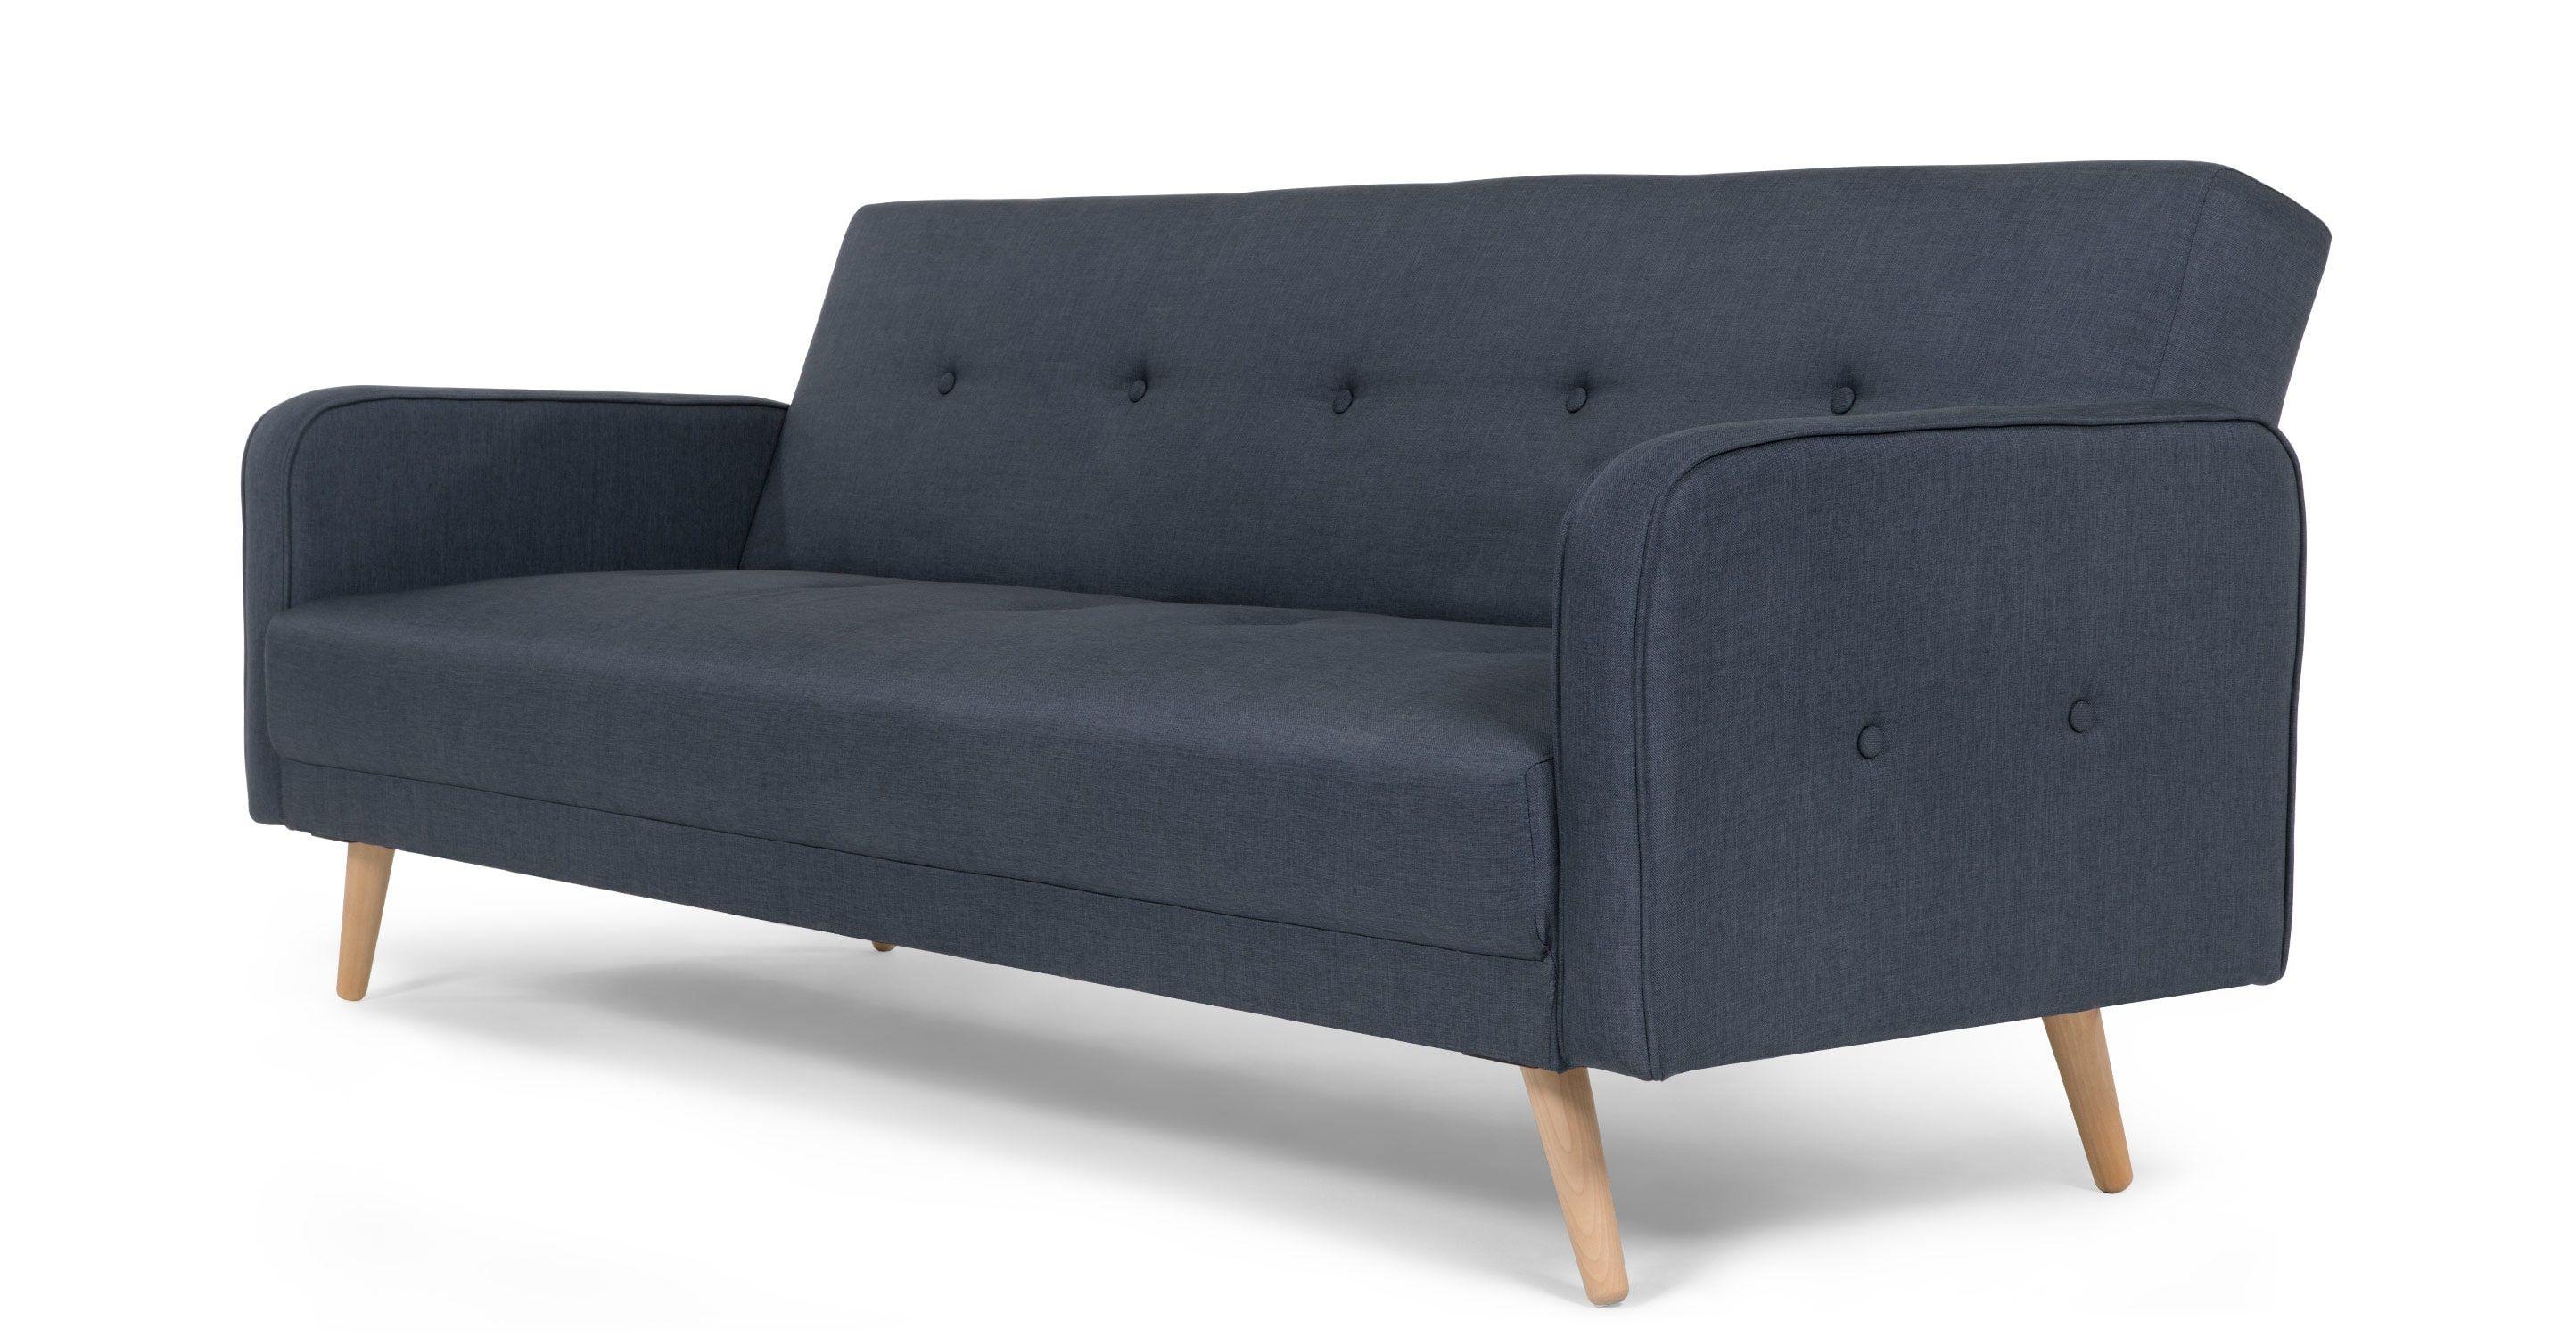 Made Quartz Blue Sofa Bed Sofa Bed For Small Spaces Sofa Bed 3